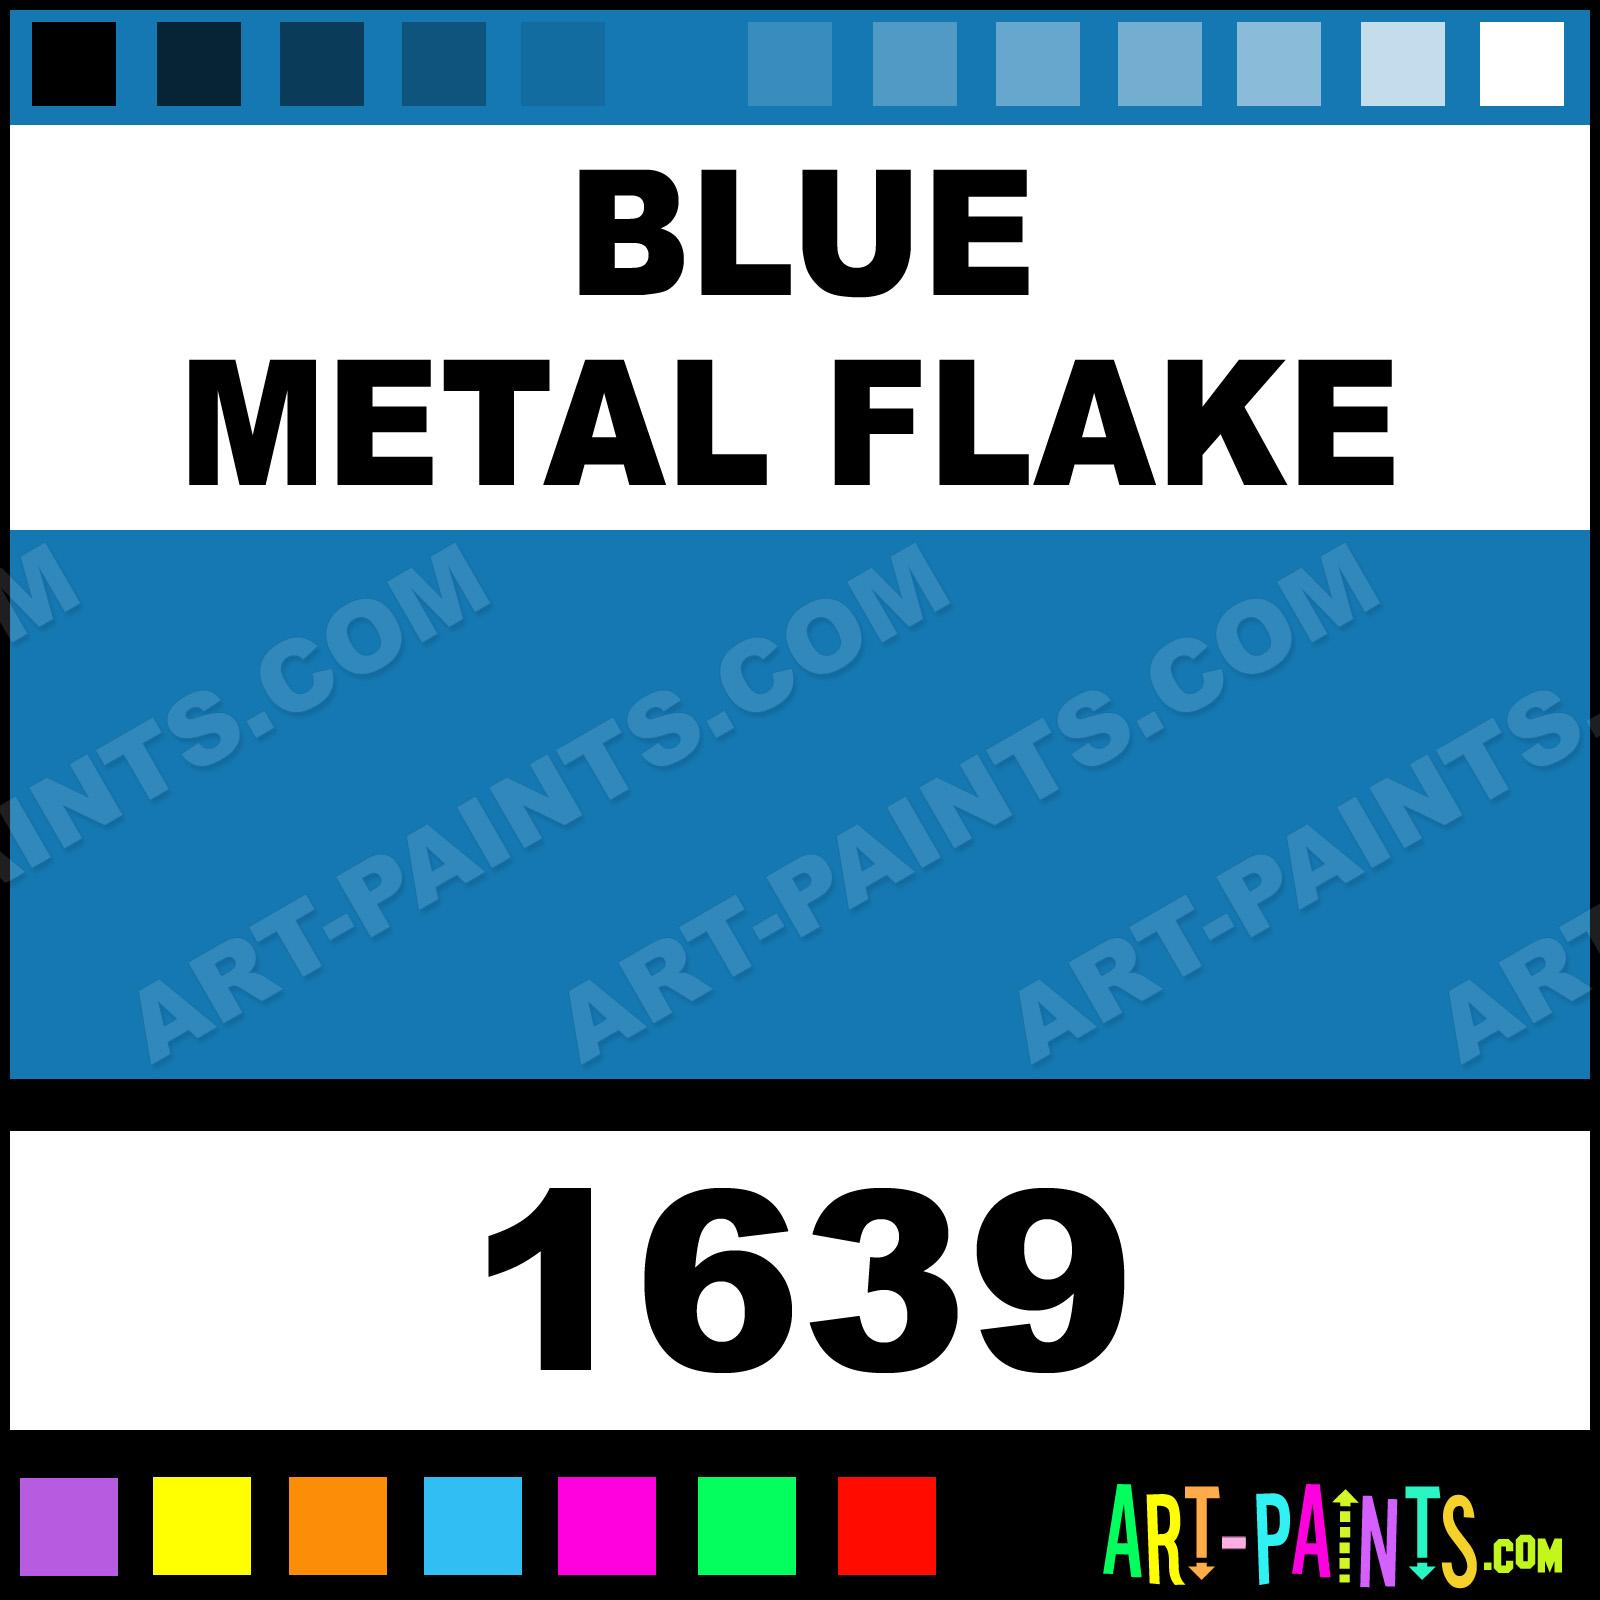 Blue Metal Flake Enamel Spray Paints - Aerosol Decorative